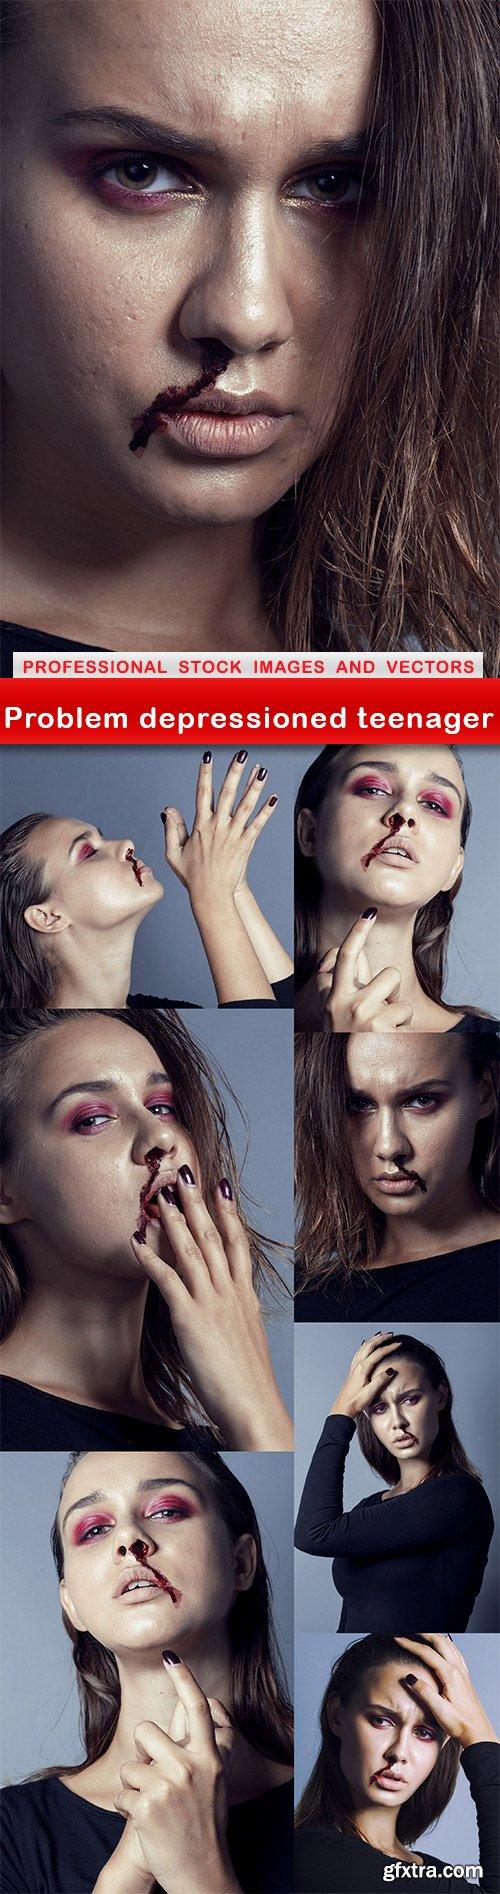 Problem depressioned teenager - 8 UHQ JPEG